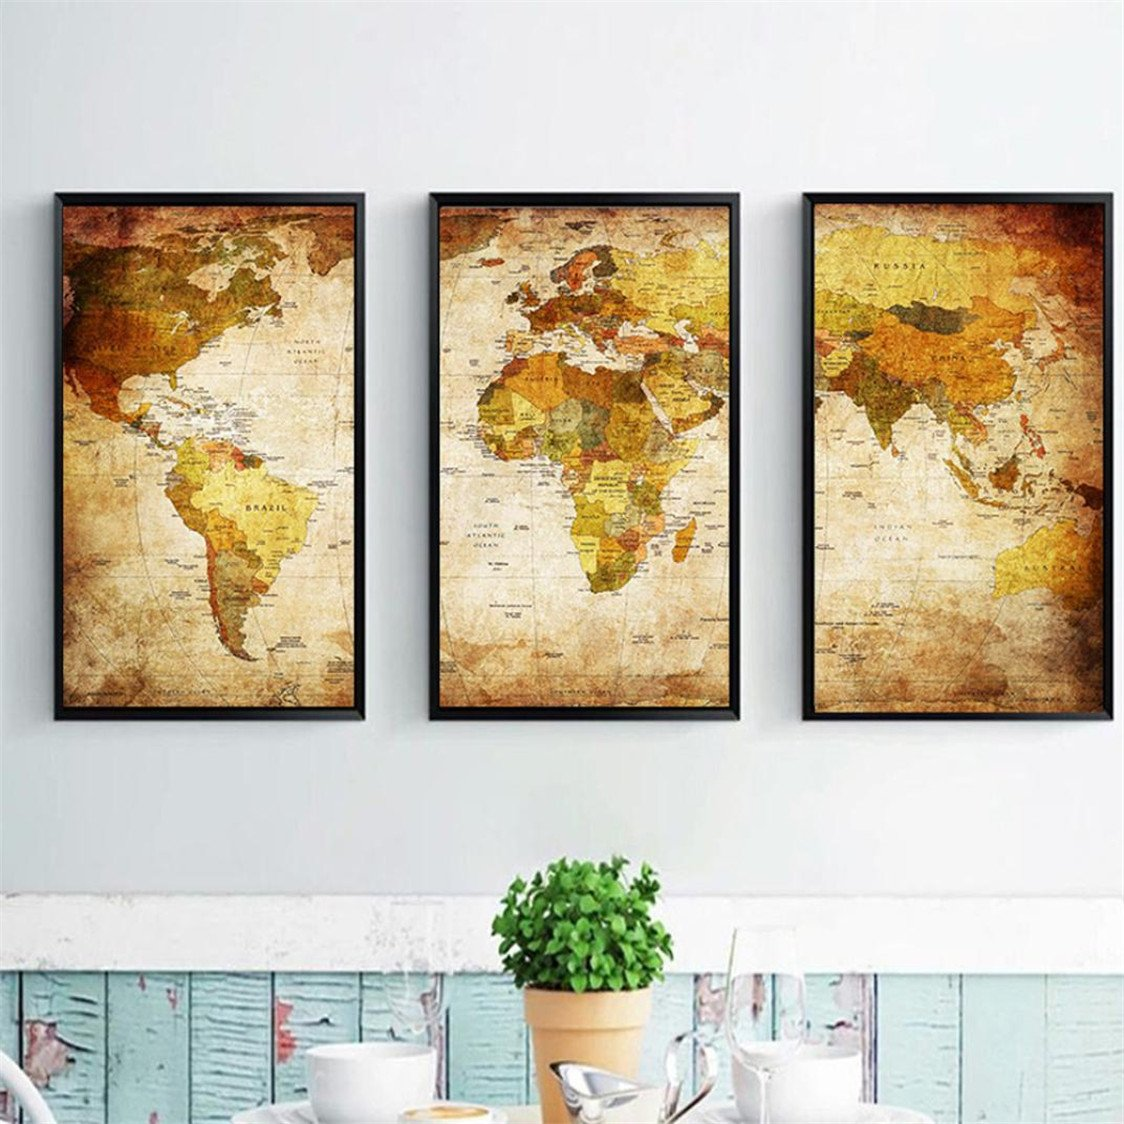 Amazon.com: 3 Pcs/Set 4080 inch Unframed Modern Home Wall Room ...